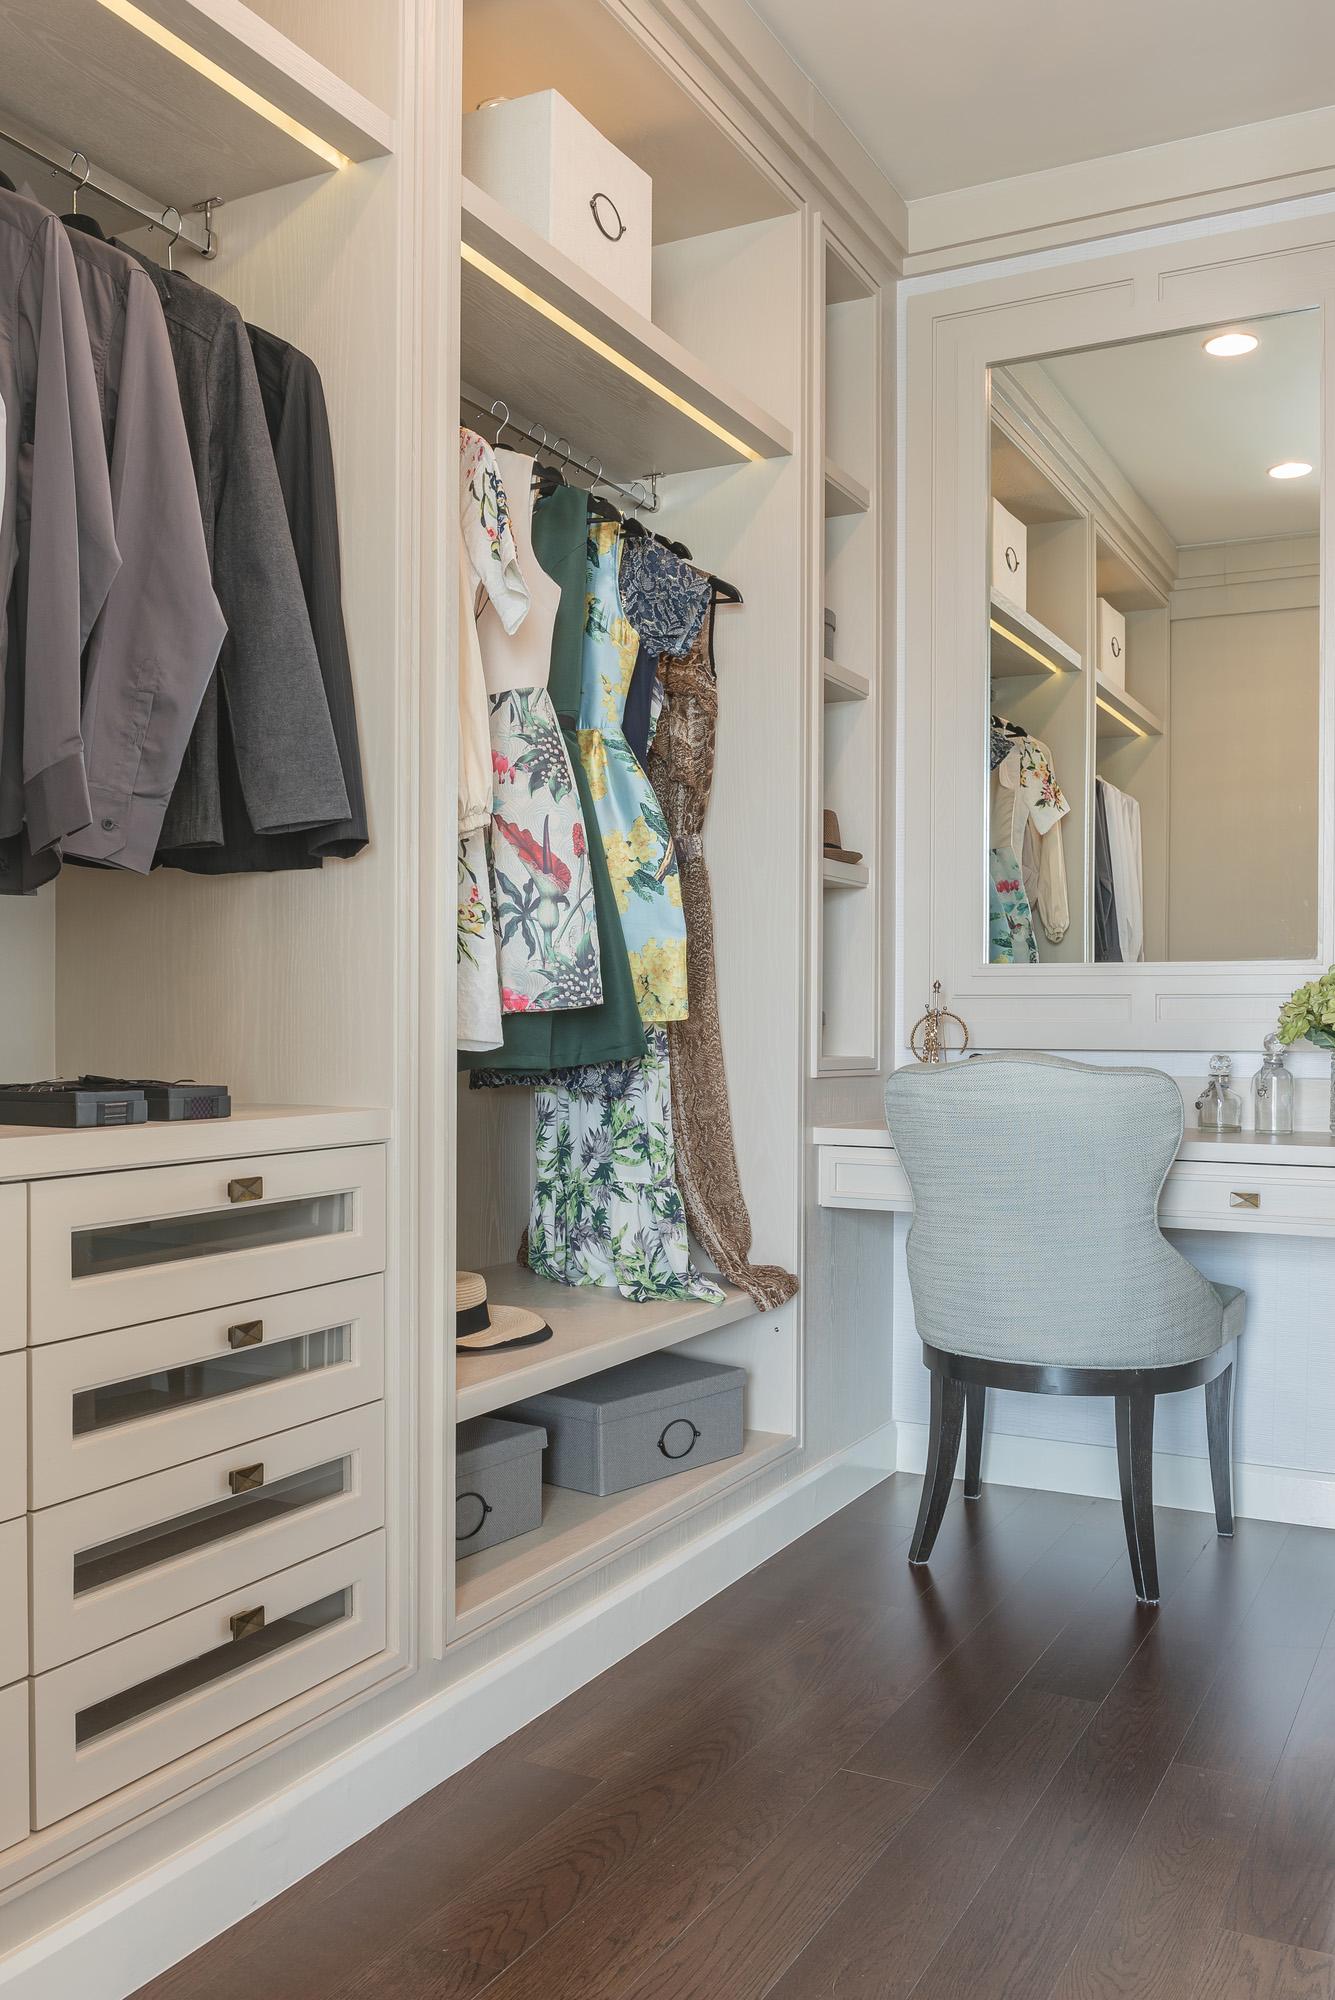 dressing room mirror, walk in wardrobe, fitted wardrobes